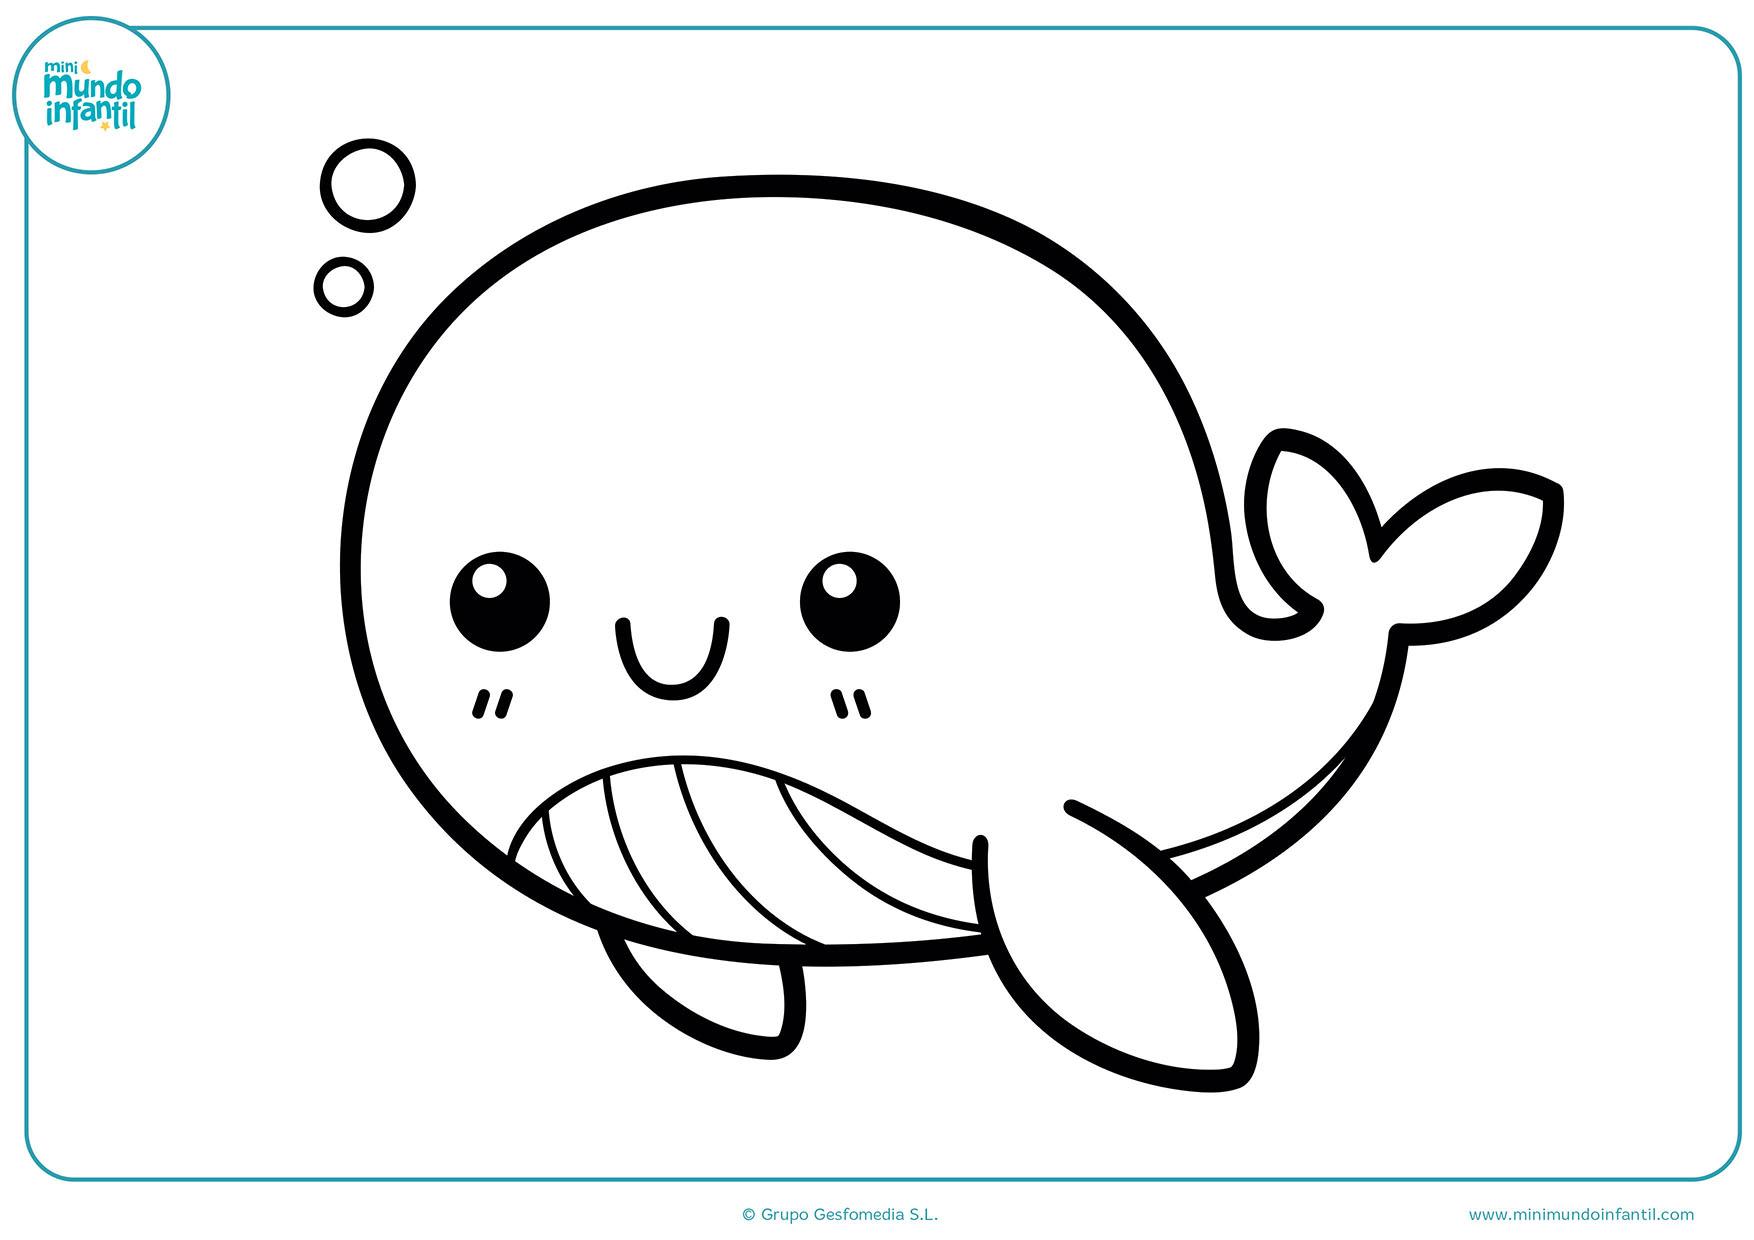 Worksheet. Dibujos de animales marinos para colorear  Mundo Primaria